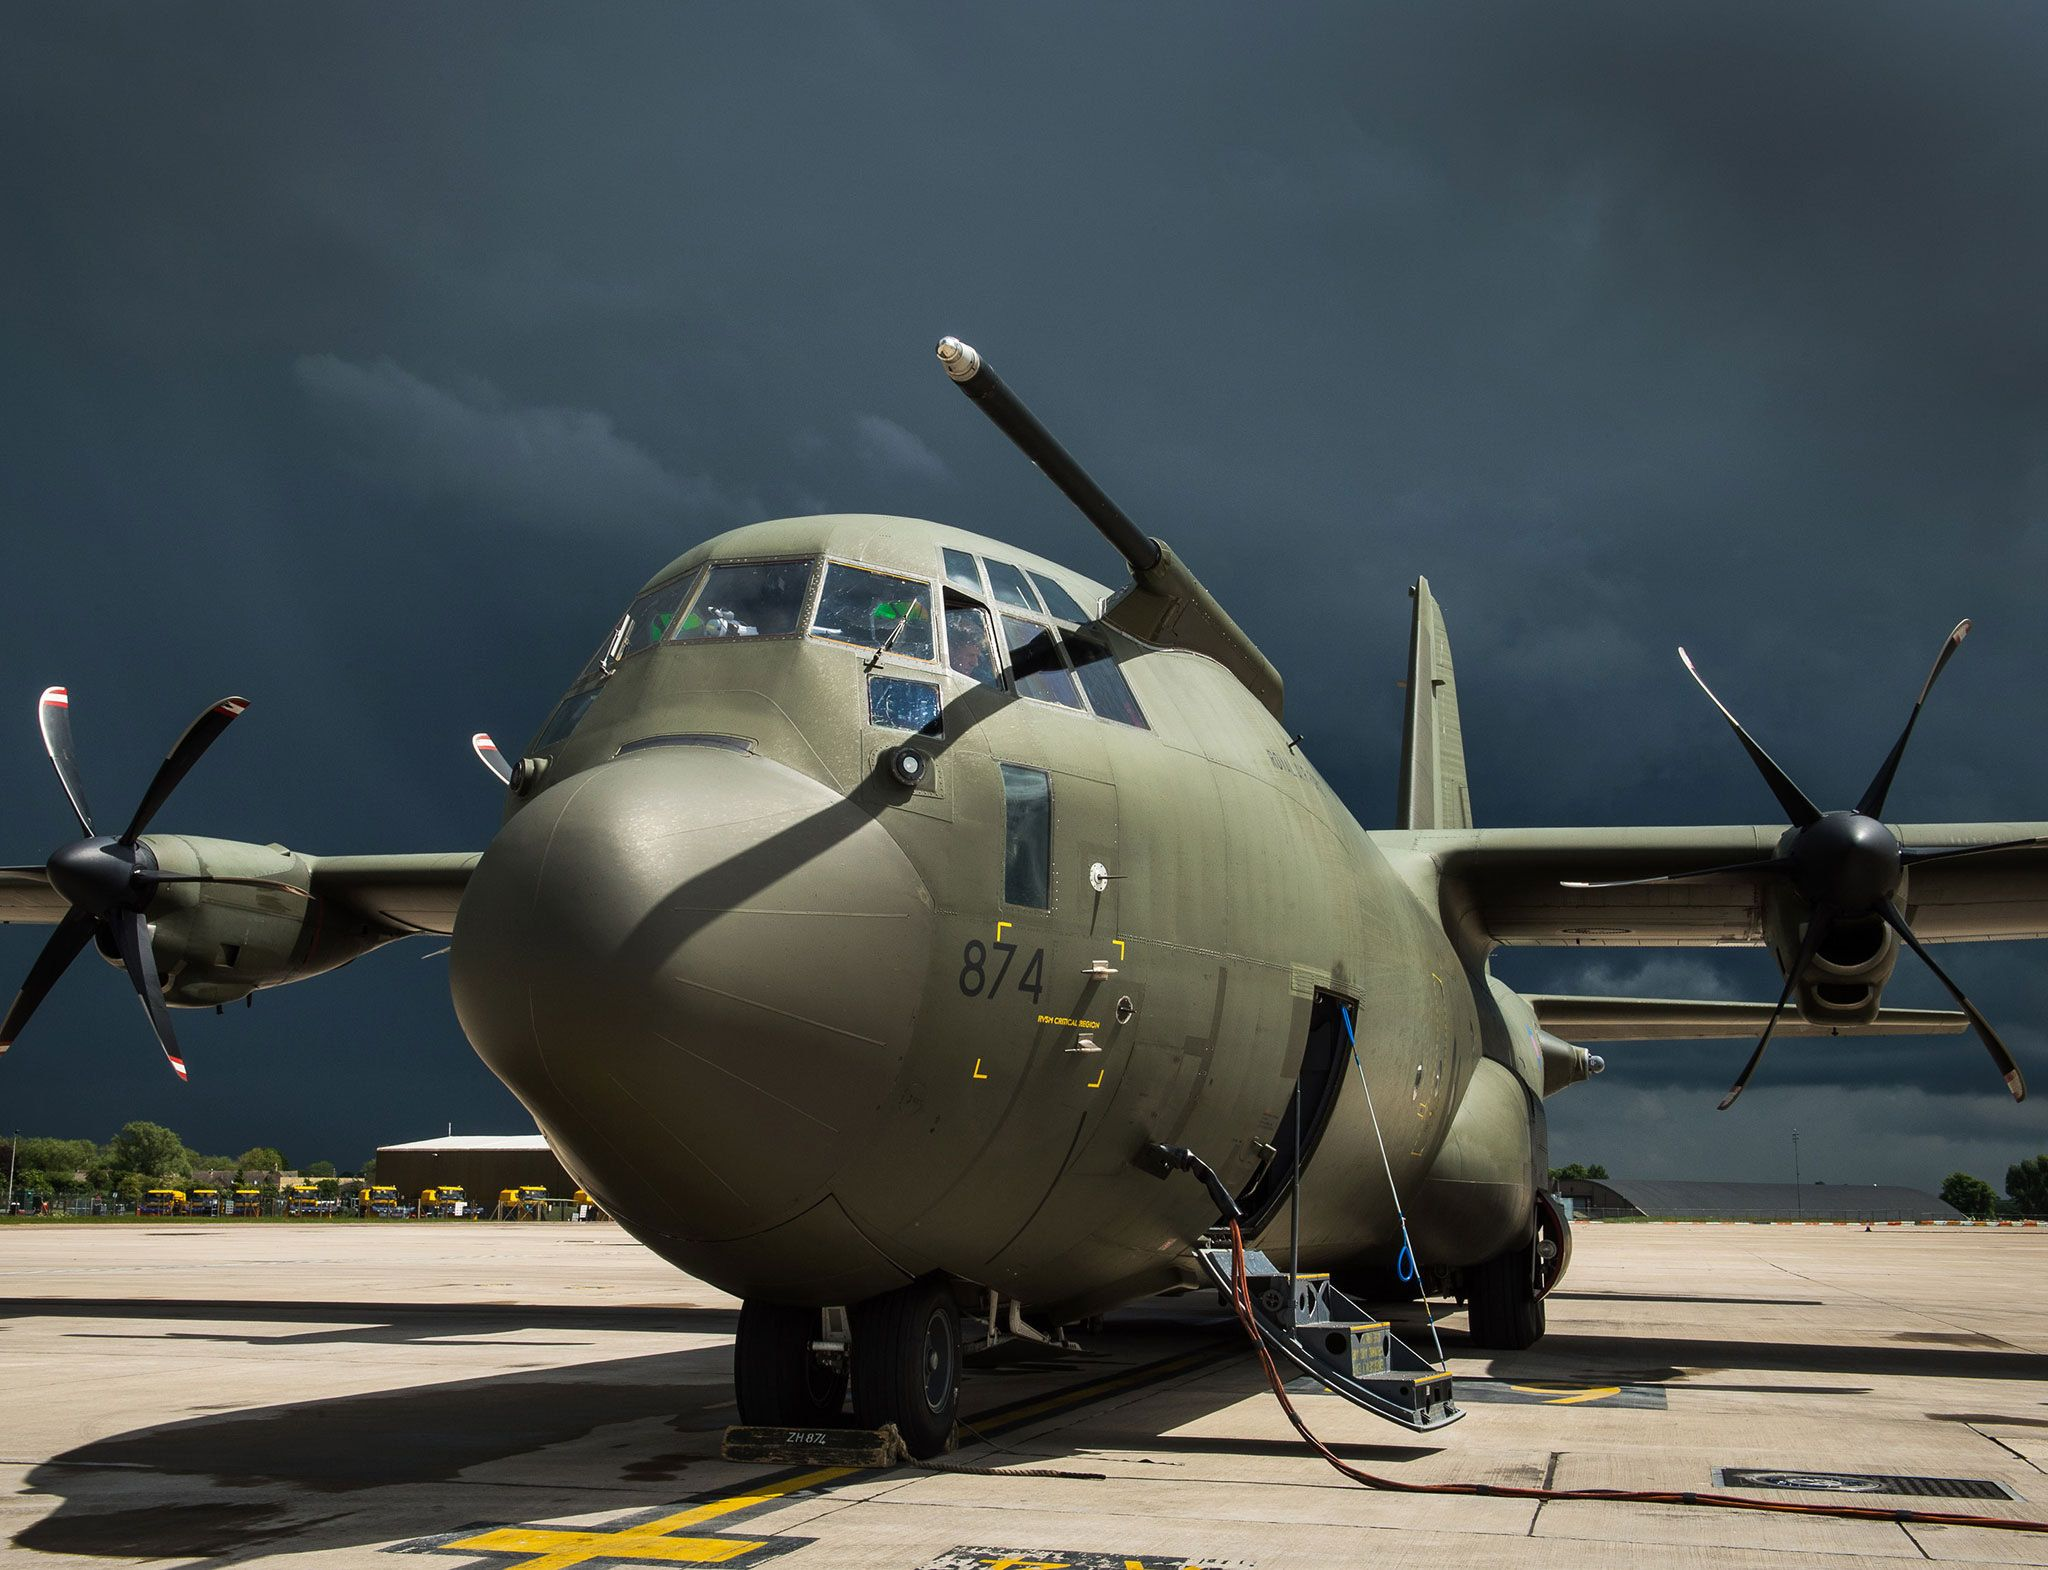 RAF C-130J RAF Brize Norton ,Photographer: Steve Lympany - RAF Brize Norton Photographic Section